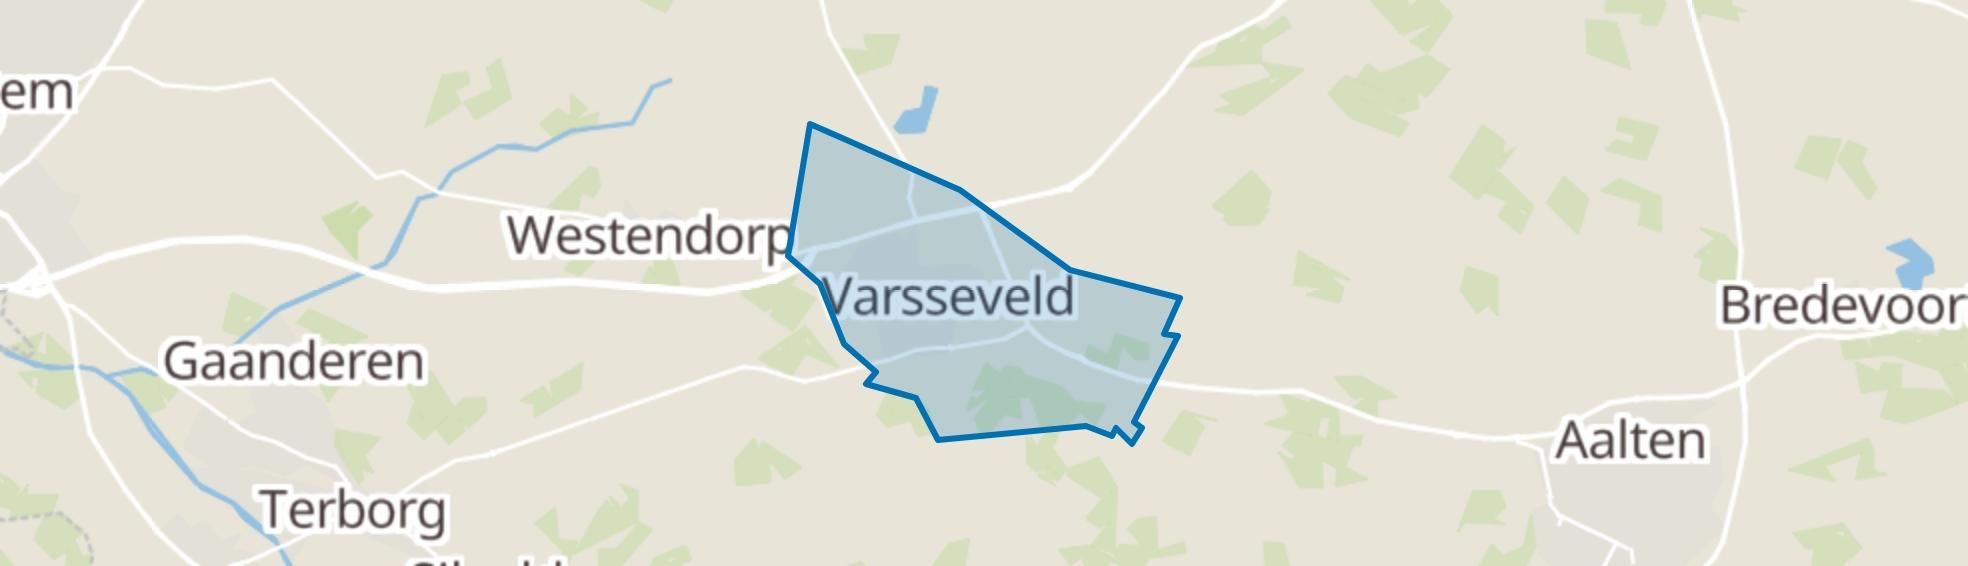 Varsseveld map